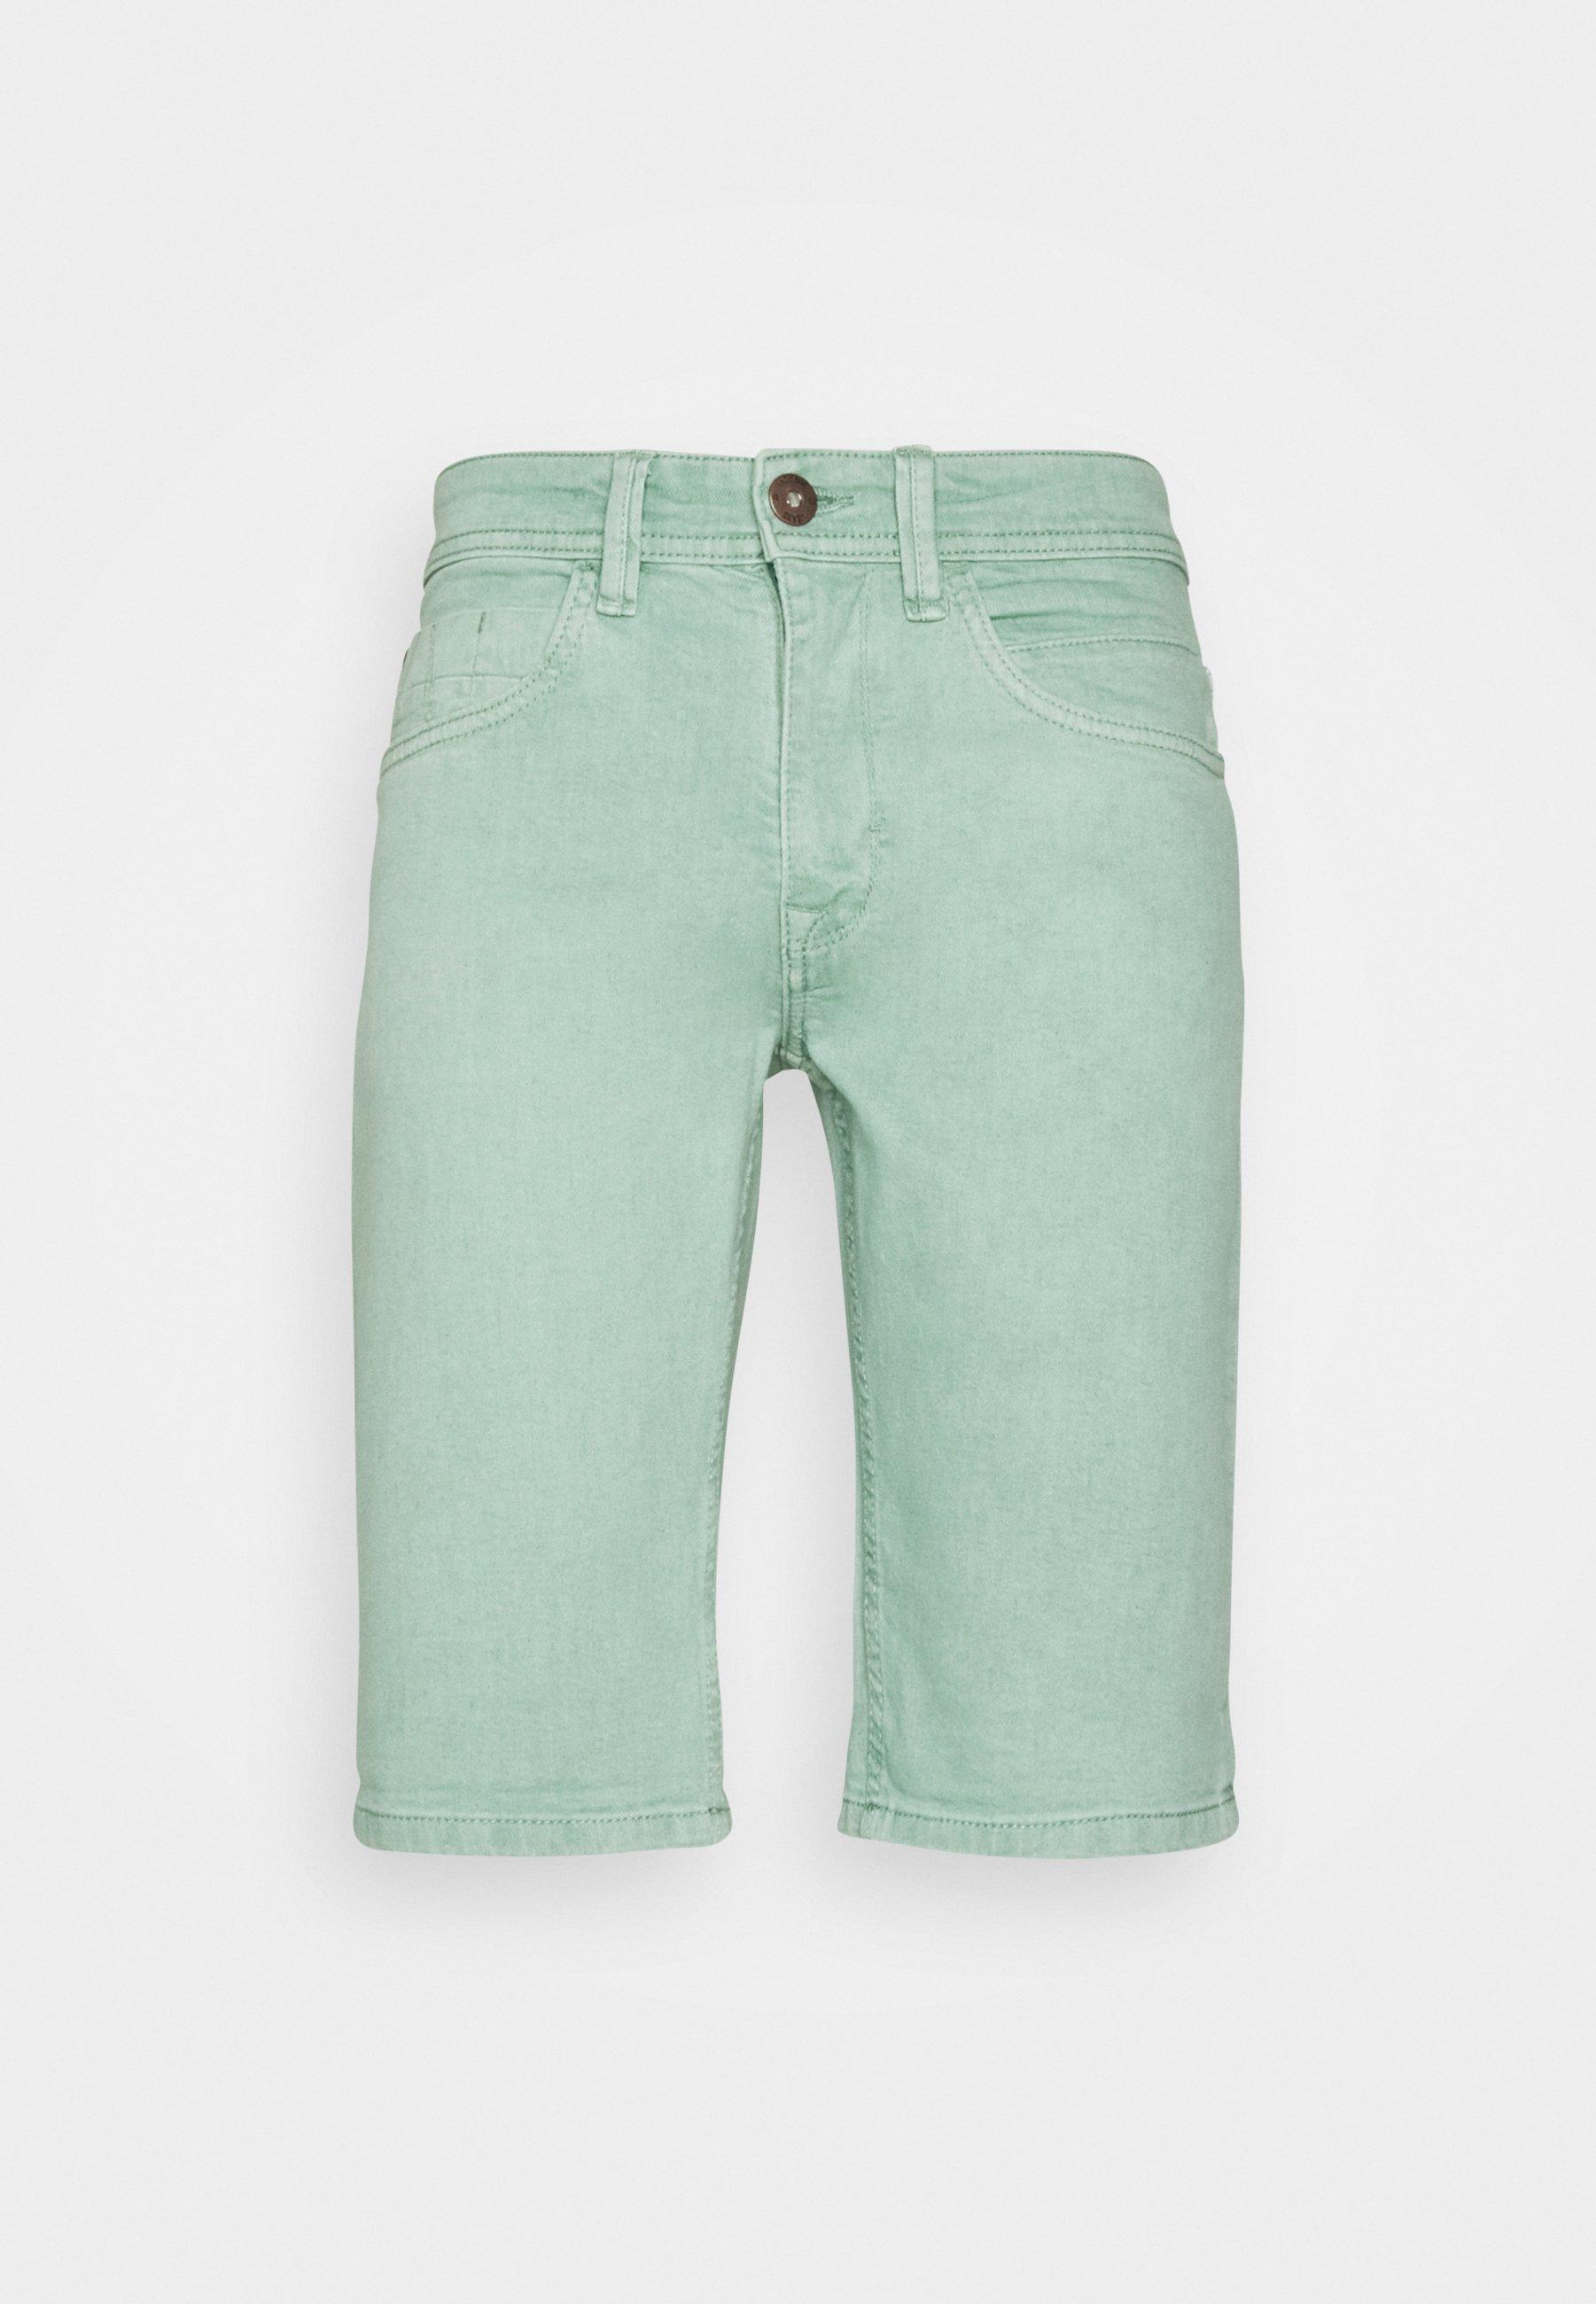 Homme MCINTOSH - Short en jean